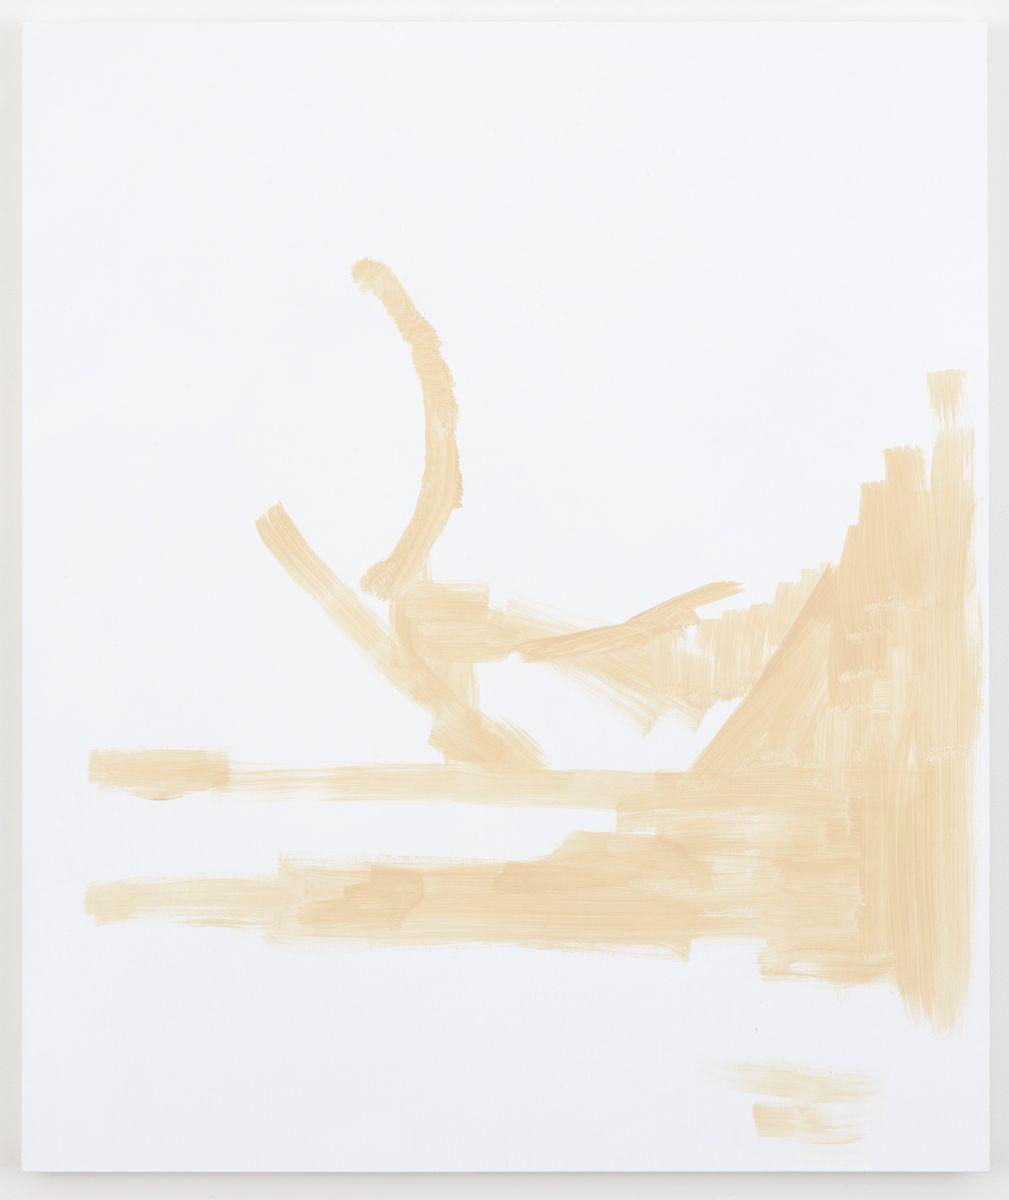 Michael Krebber Herbes de Provence MK.6073, 2018 Acrylic on canvas 50 x 42 inches (127 x 106.7 cm)